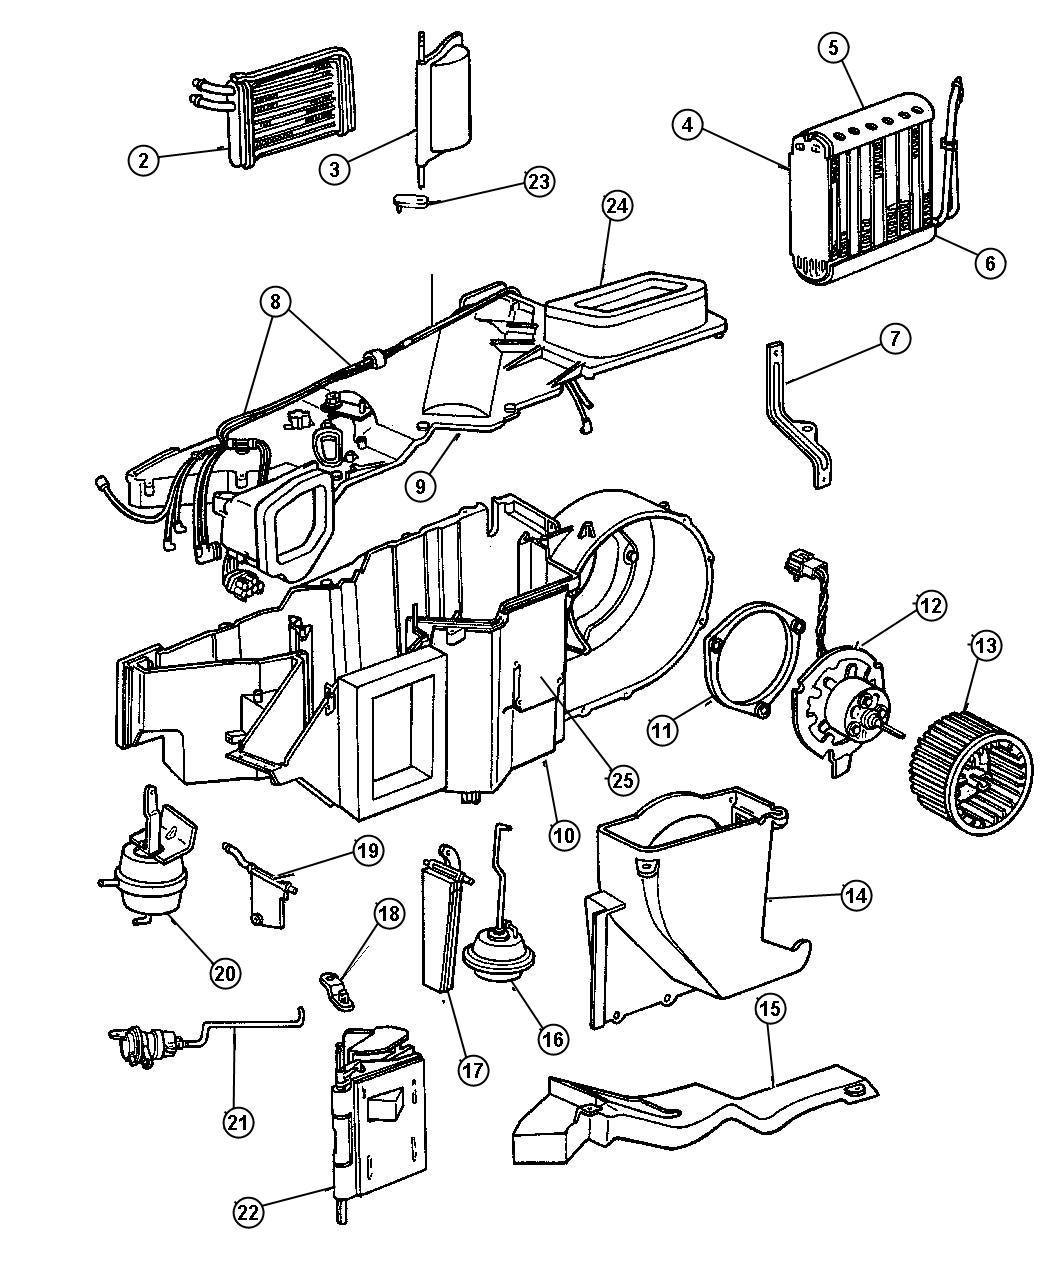 Part diagram 2000 dodge durango heater core